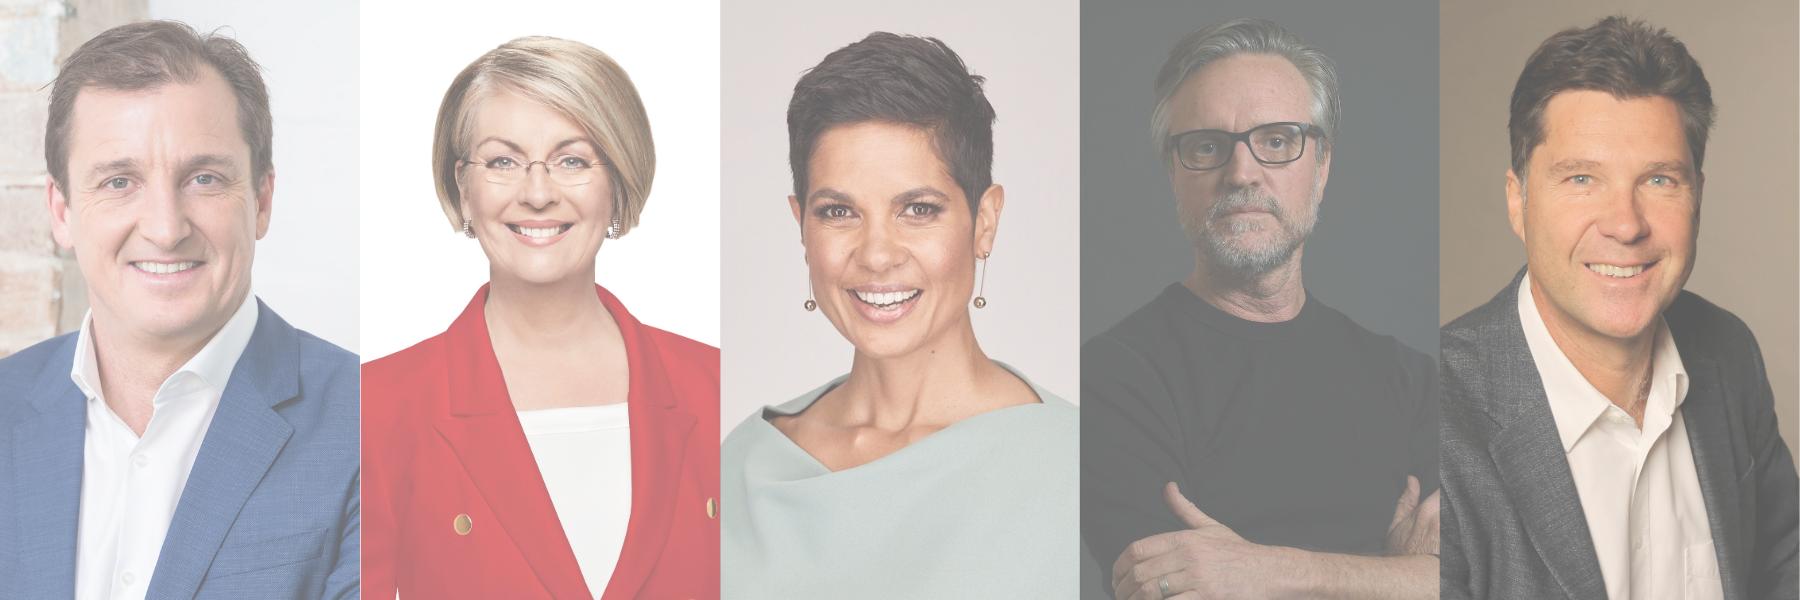 Walkley Foundation announces new Judging Board members